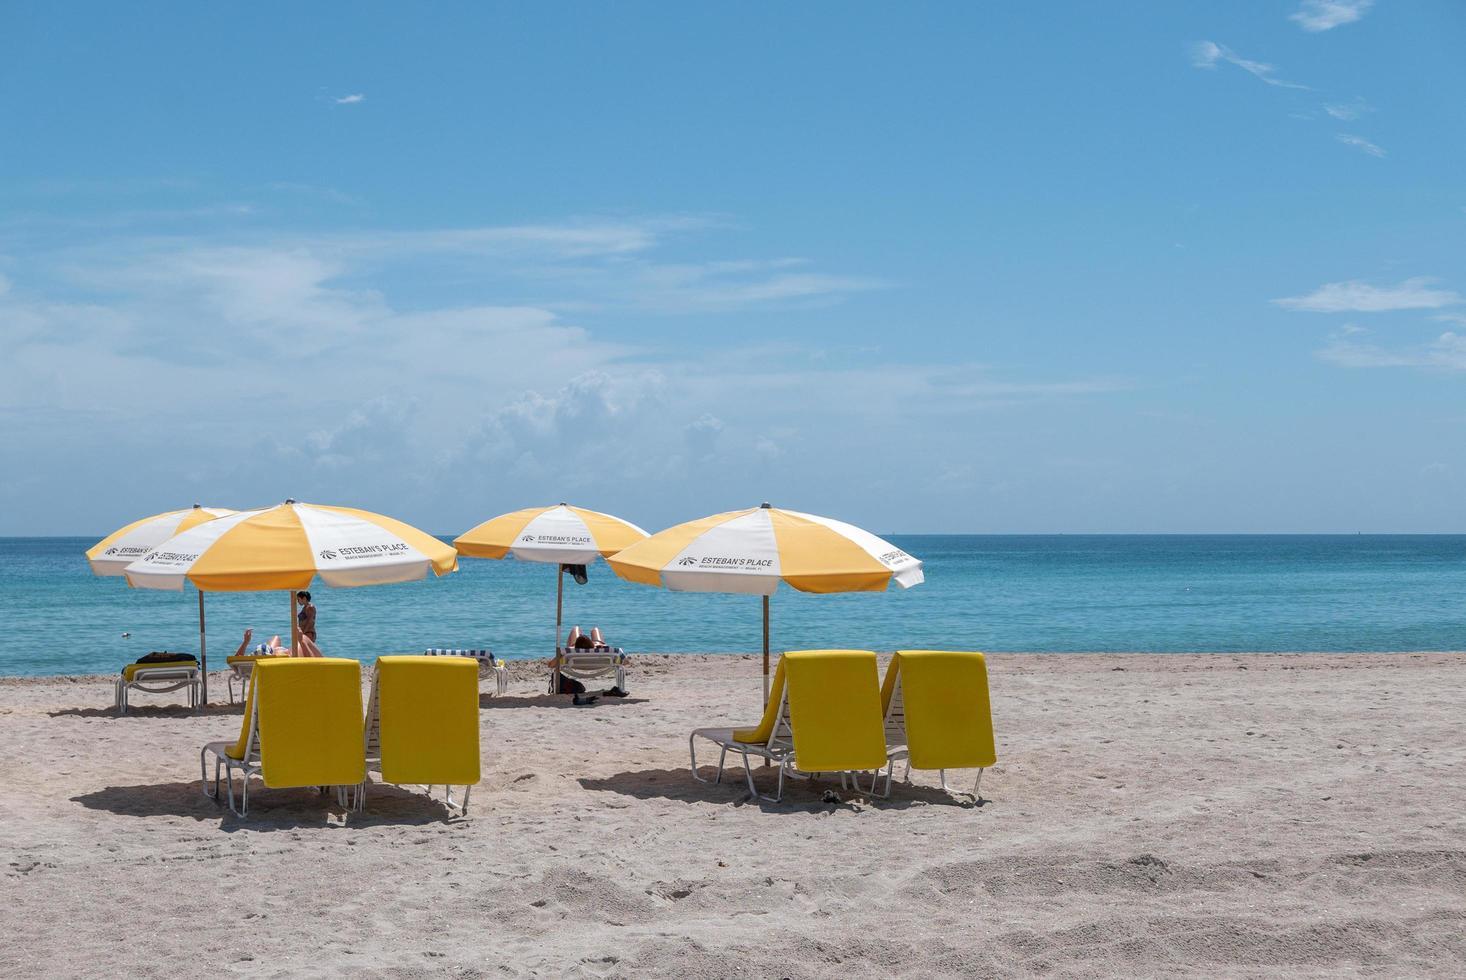 Miami, Florida, 2020 - Beachgoers with yellow umbrella and chairs on beach photo